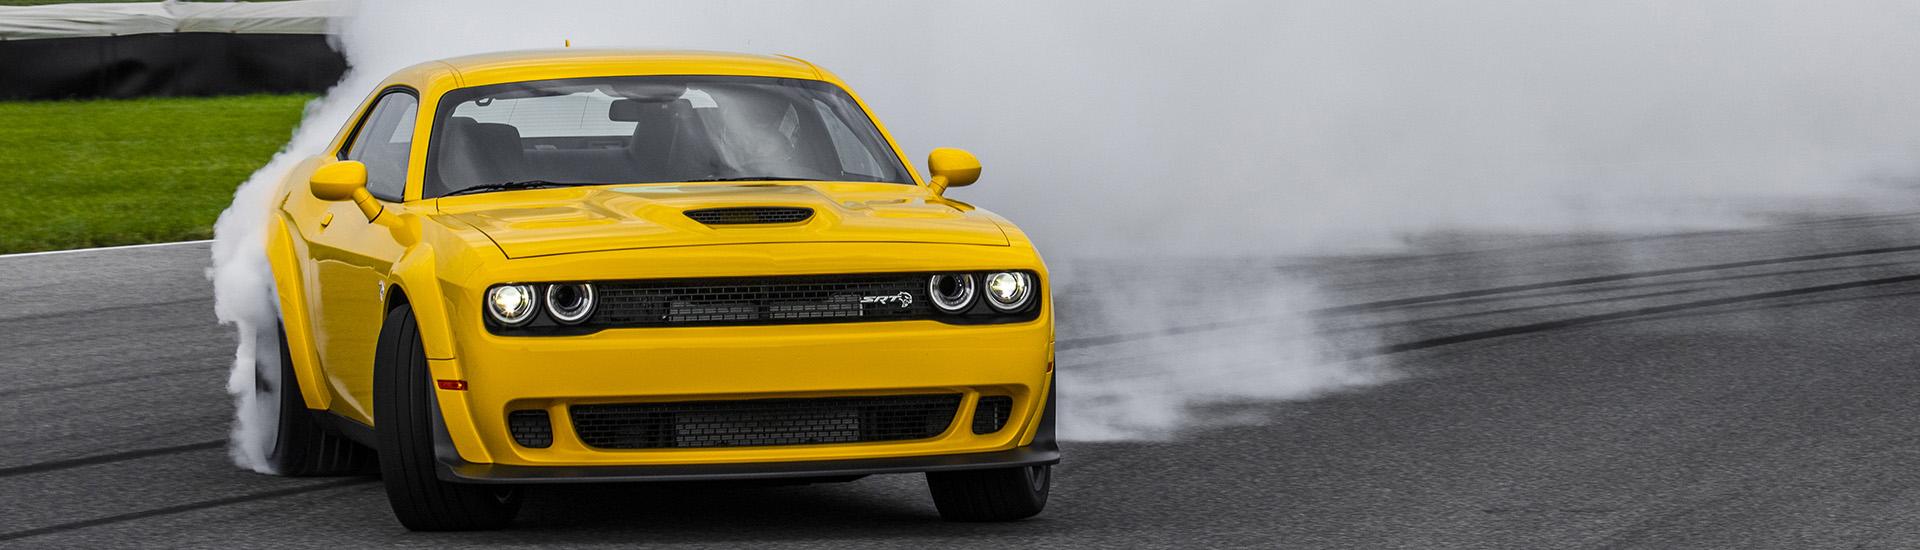 Dodge Challenger Hellcat drifting